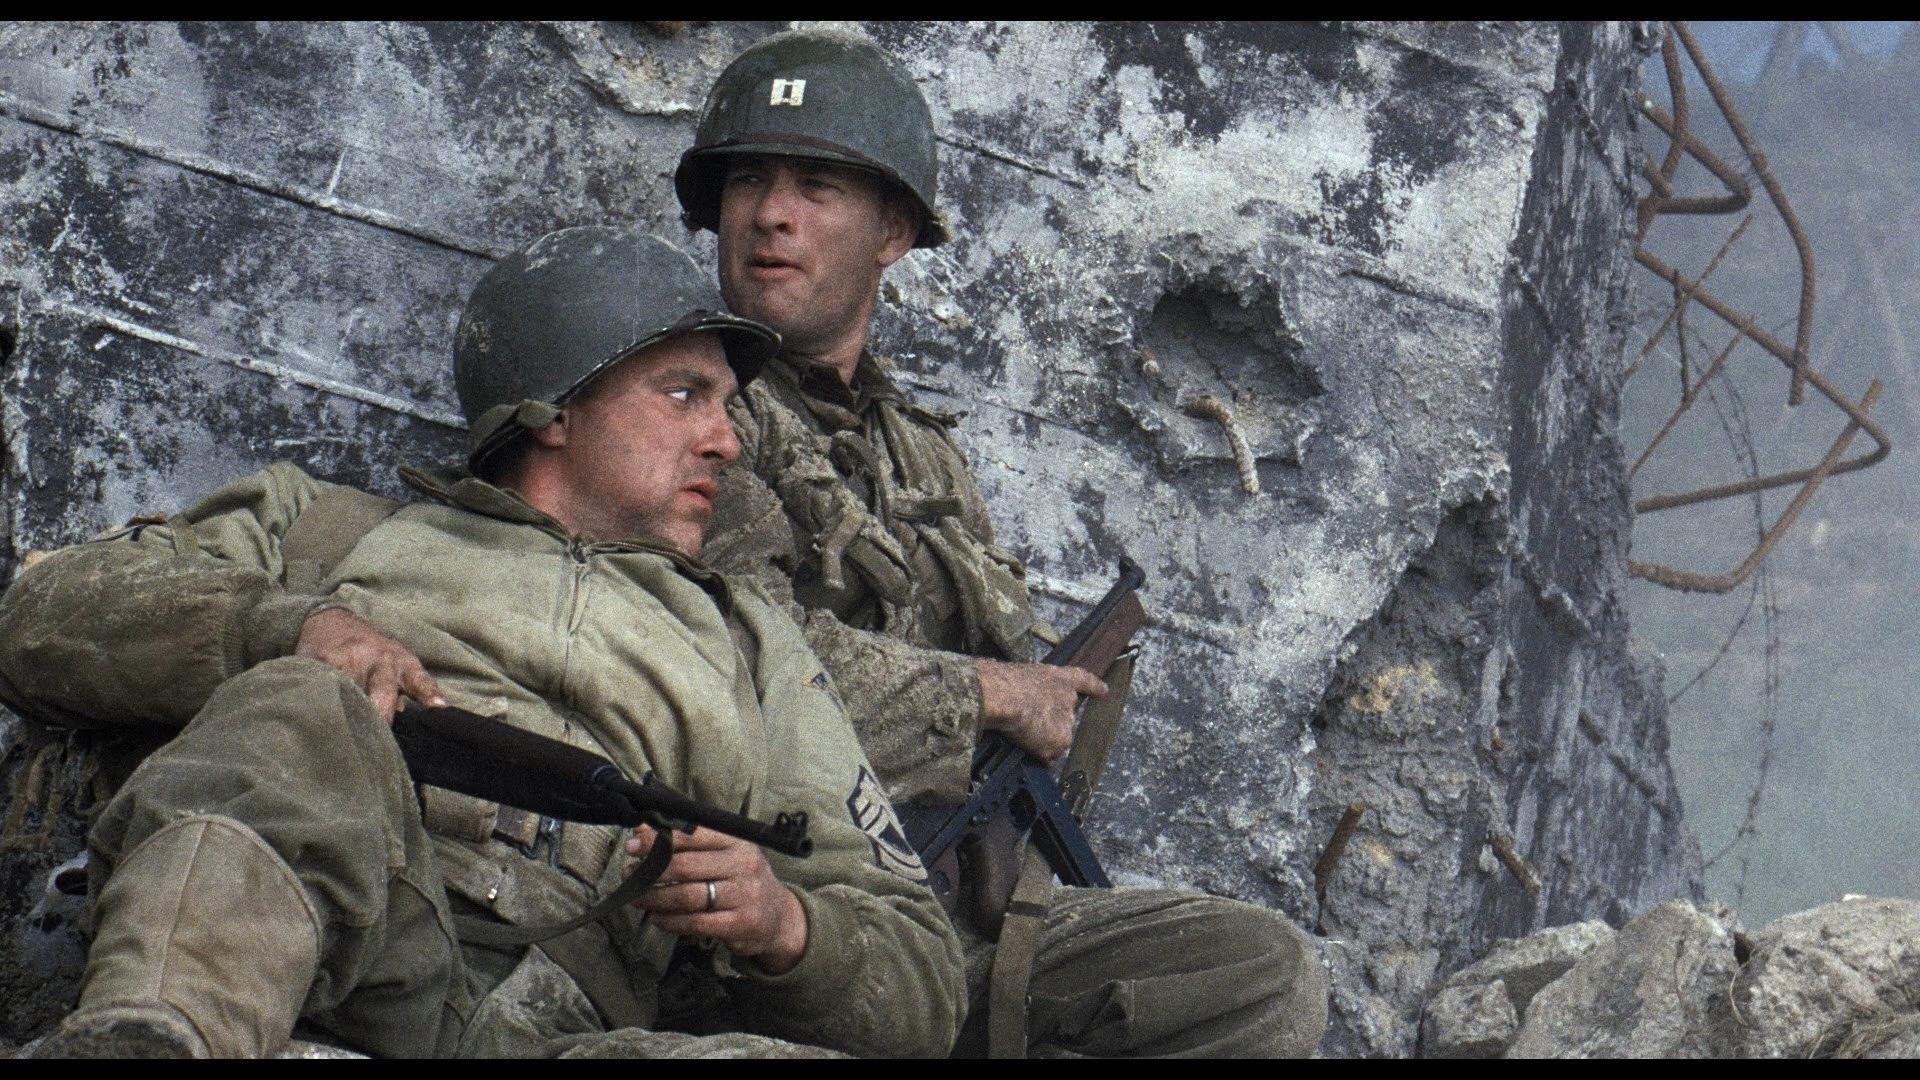 Saving Private Ryan Drama Action Tom Hanks Military U Wallpaper